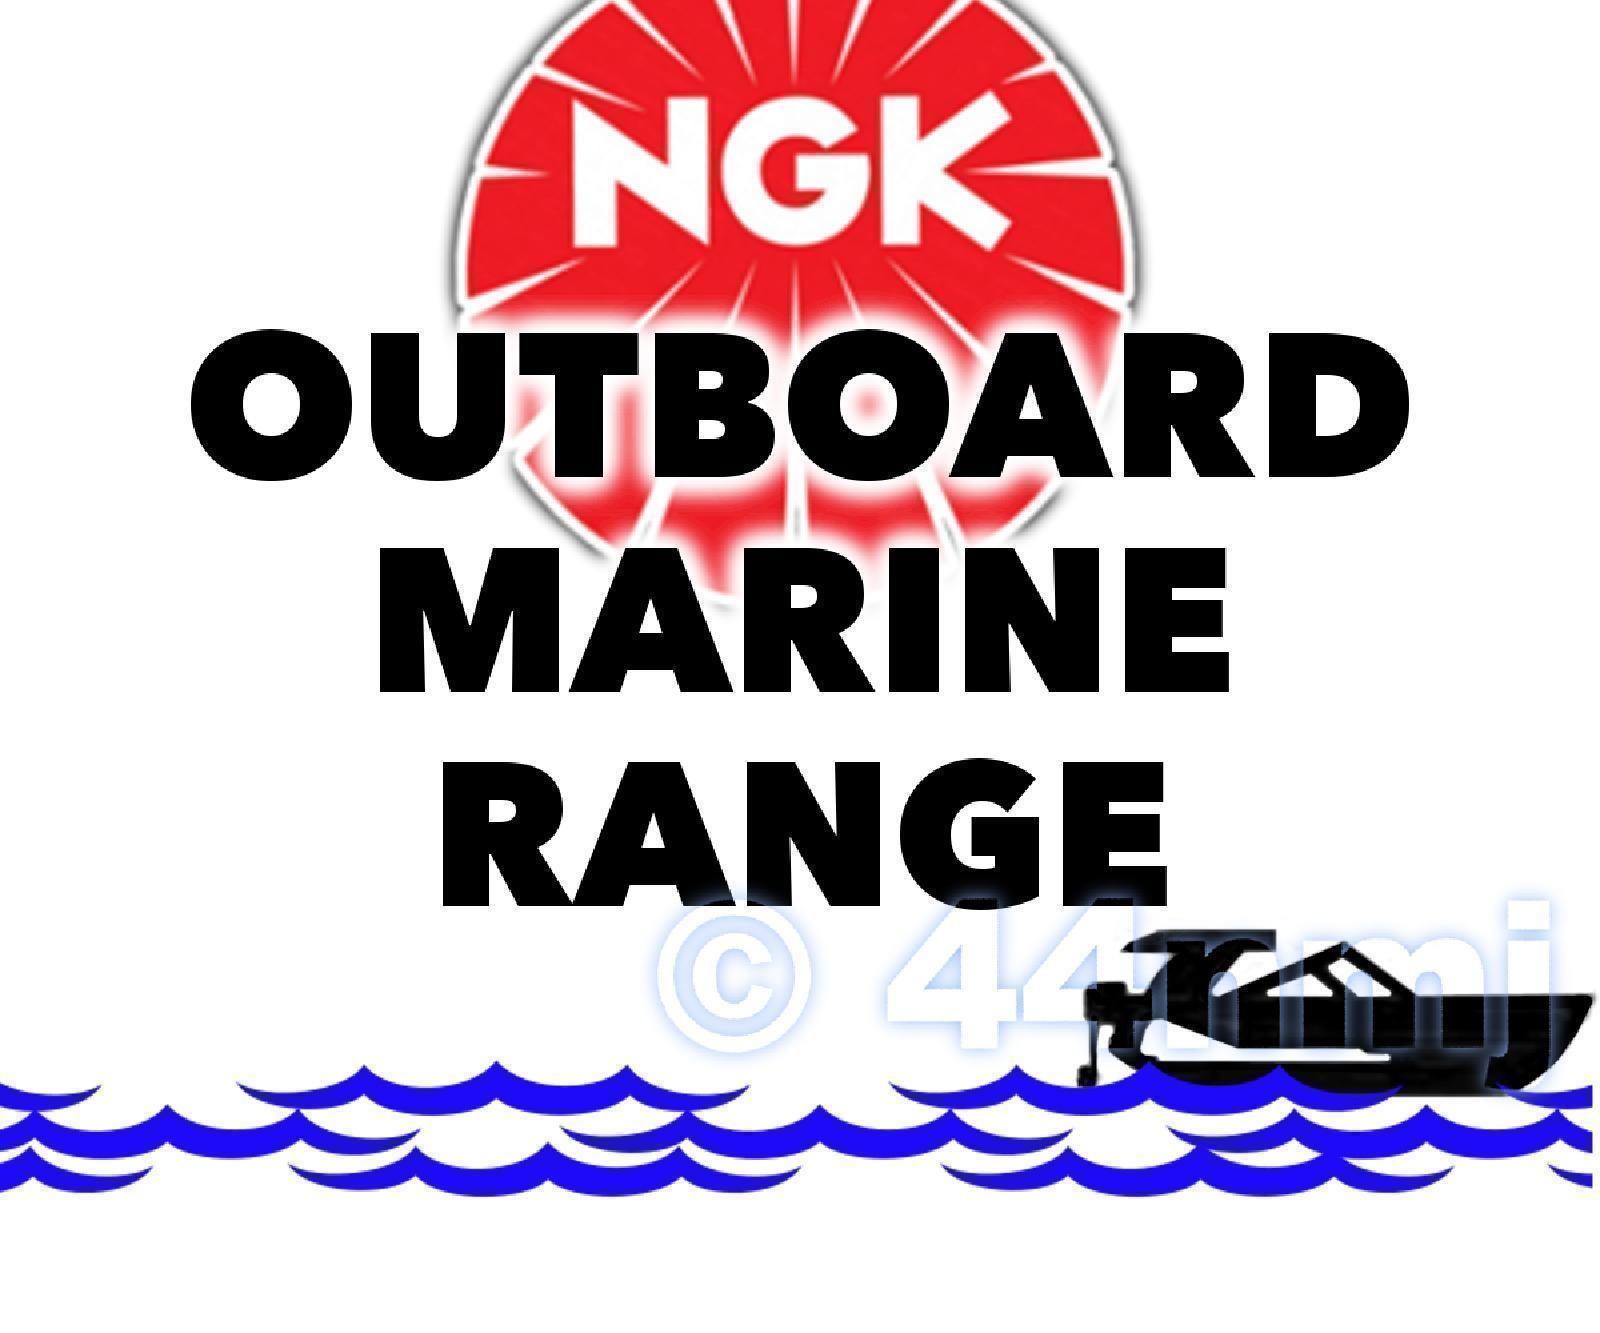 Details about NGK SPARK PLUG For Marine Outboard Engine HONDA BF20 1-cyl   4-Stroke 84-->98